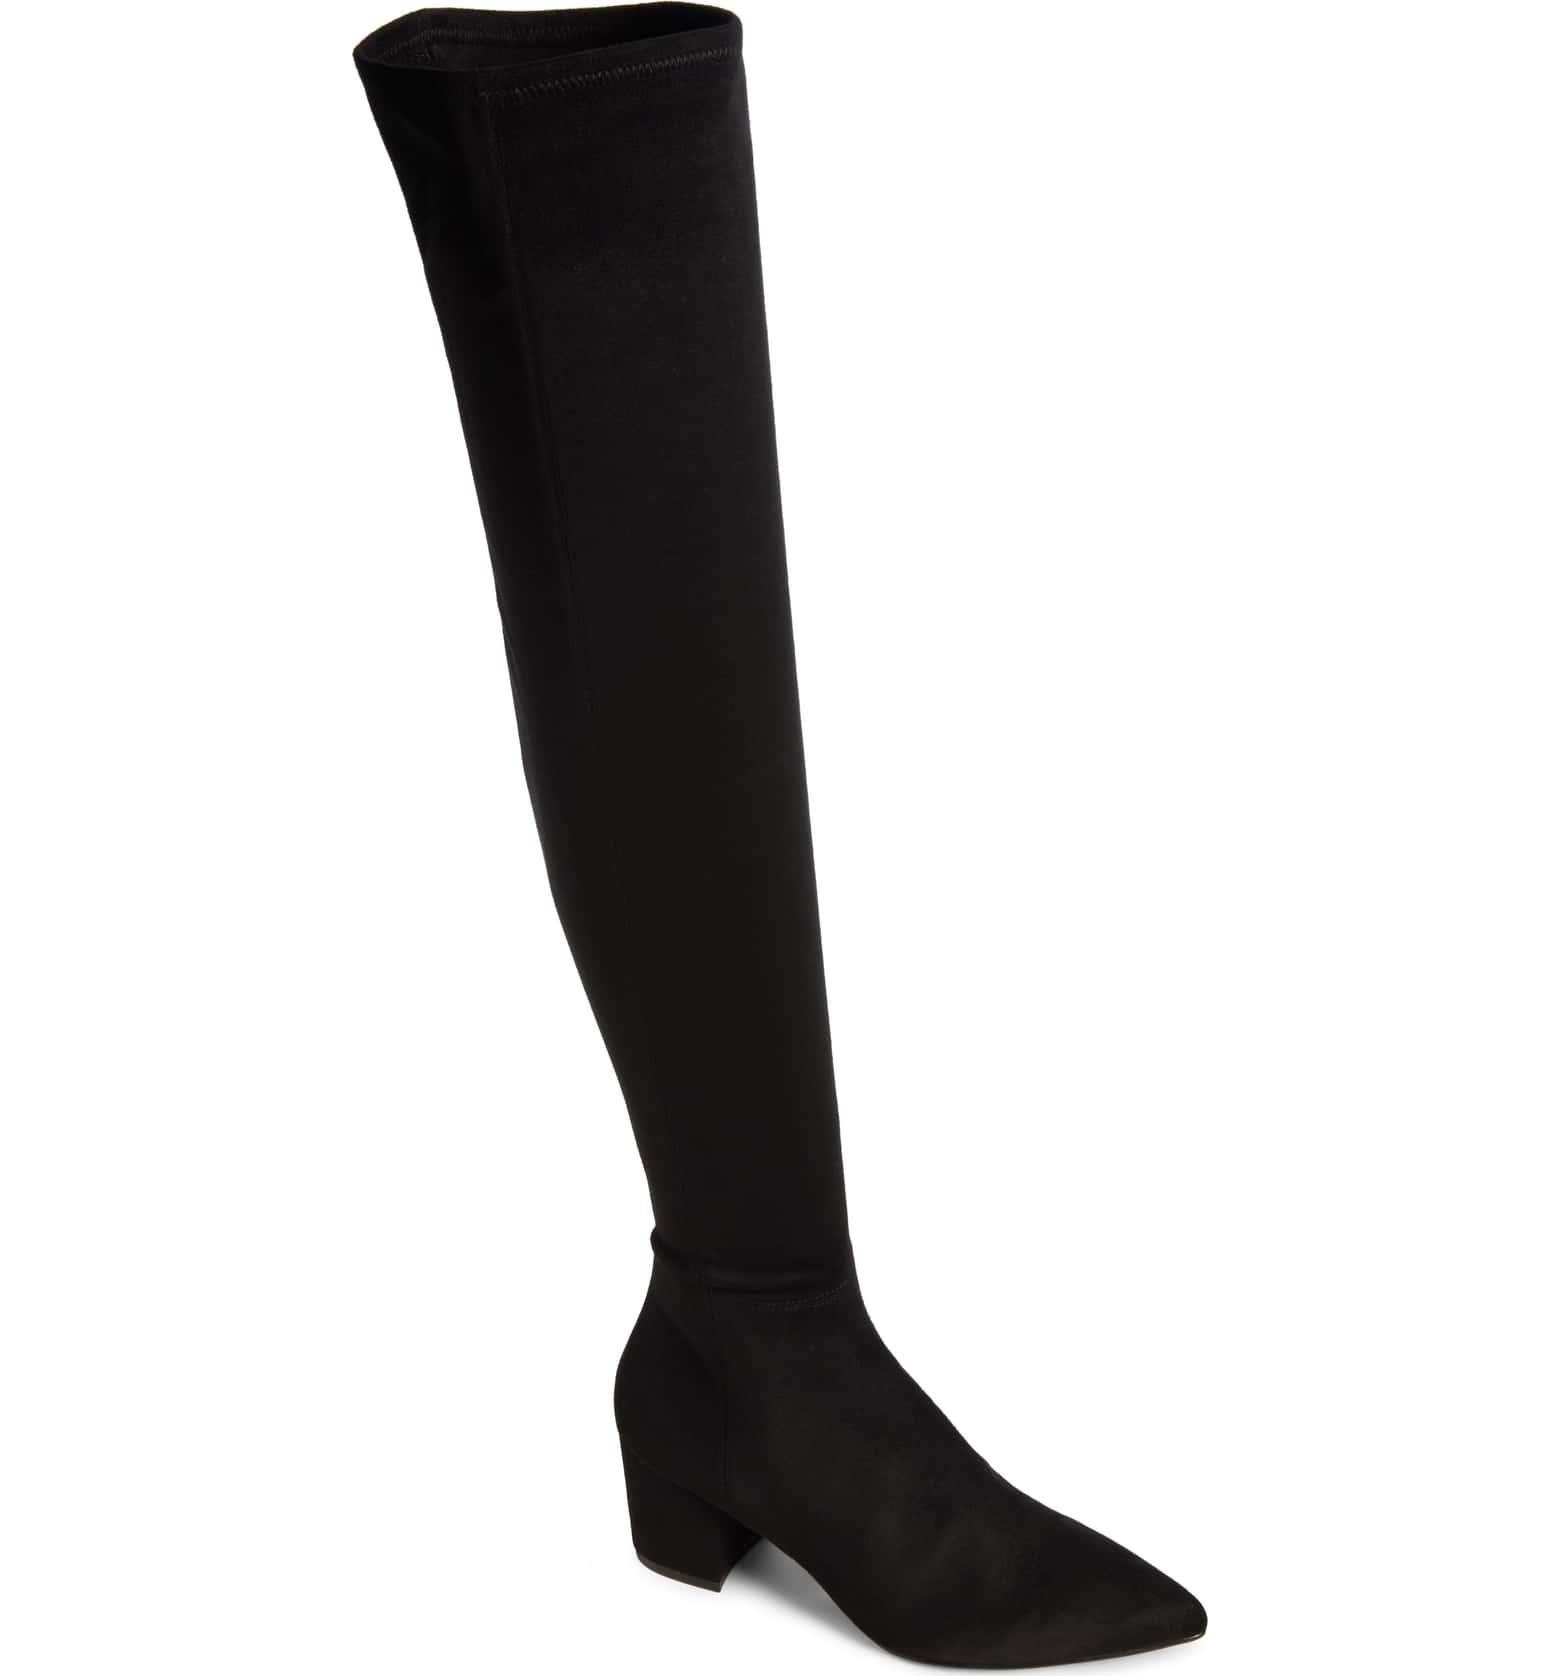 Nordstrom: Steve Madden Over-the-Knee Boots